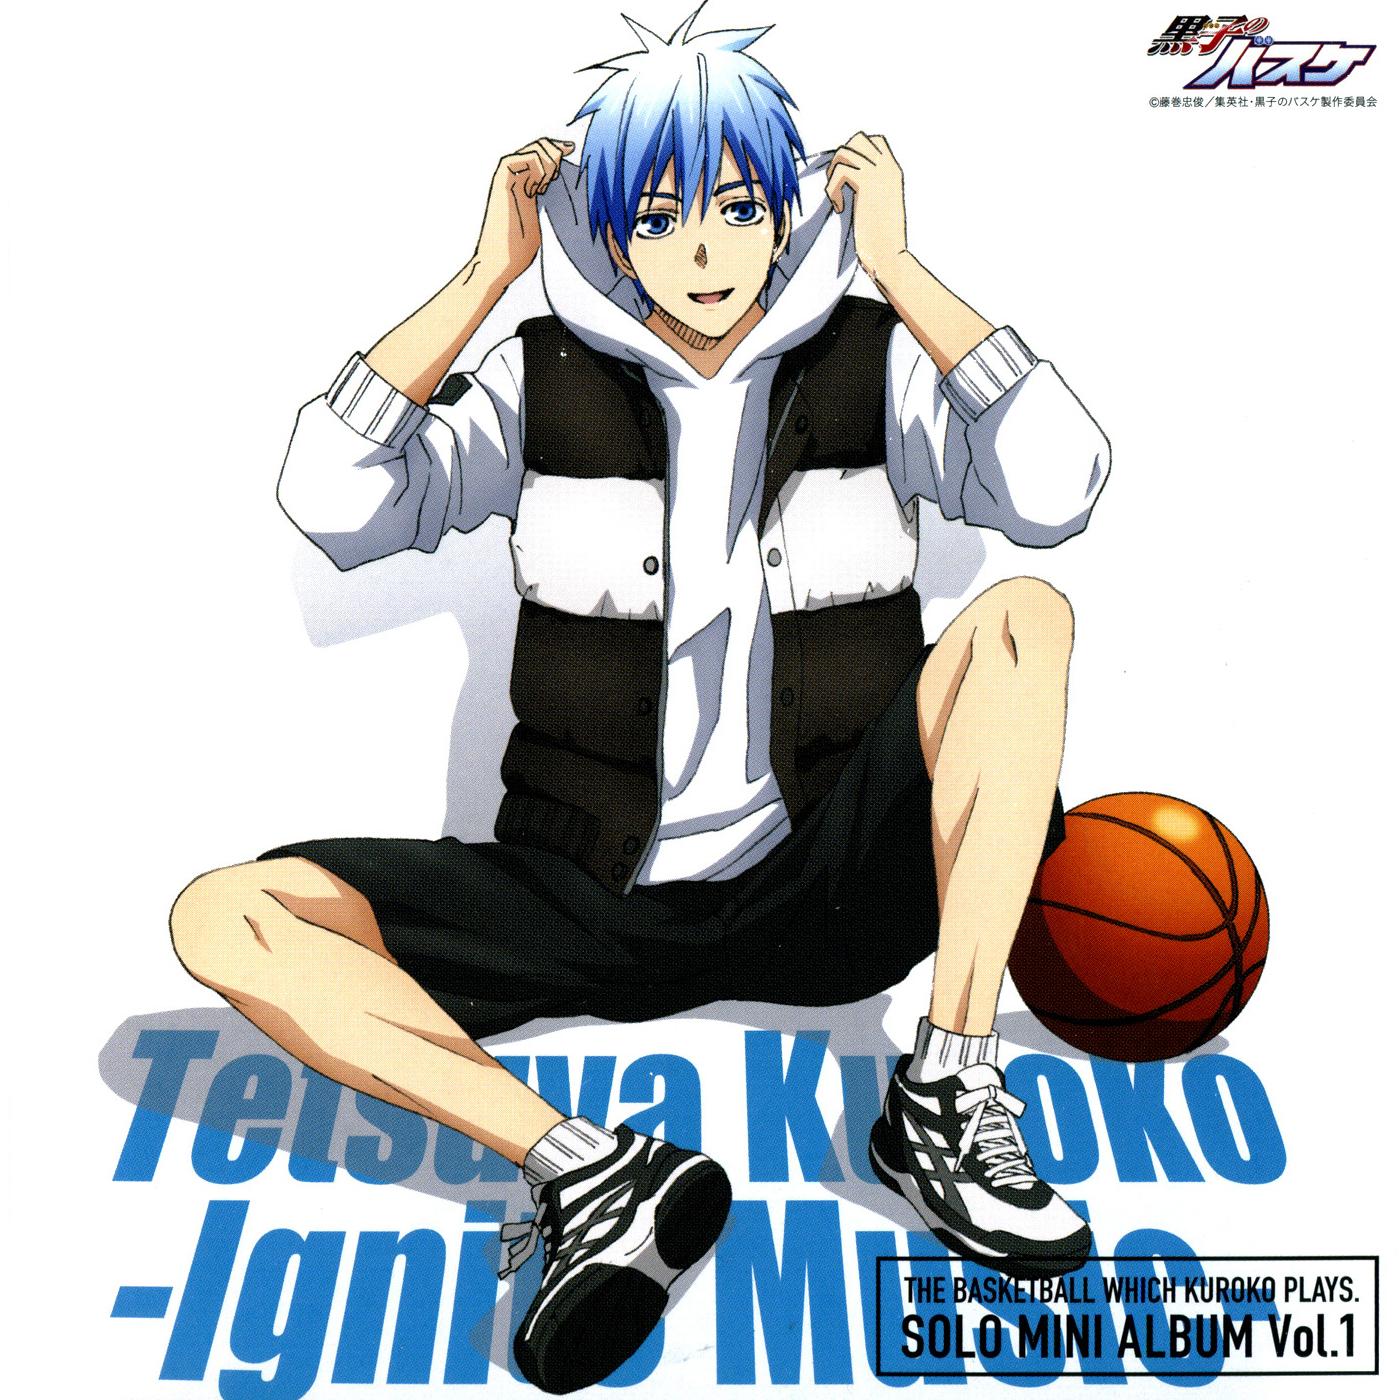 Download Soundtrack Kuroko No Basuke Mp3